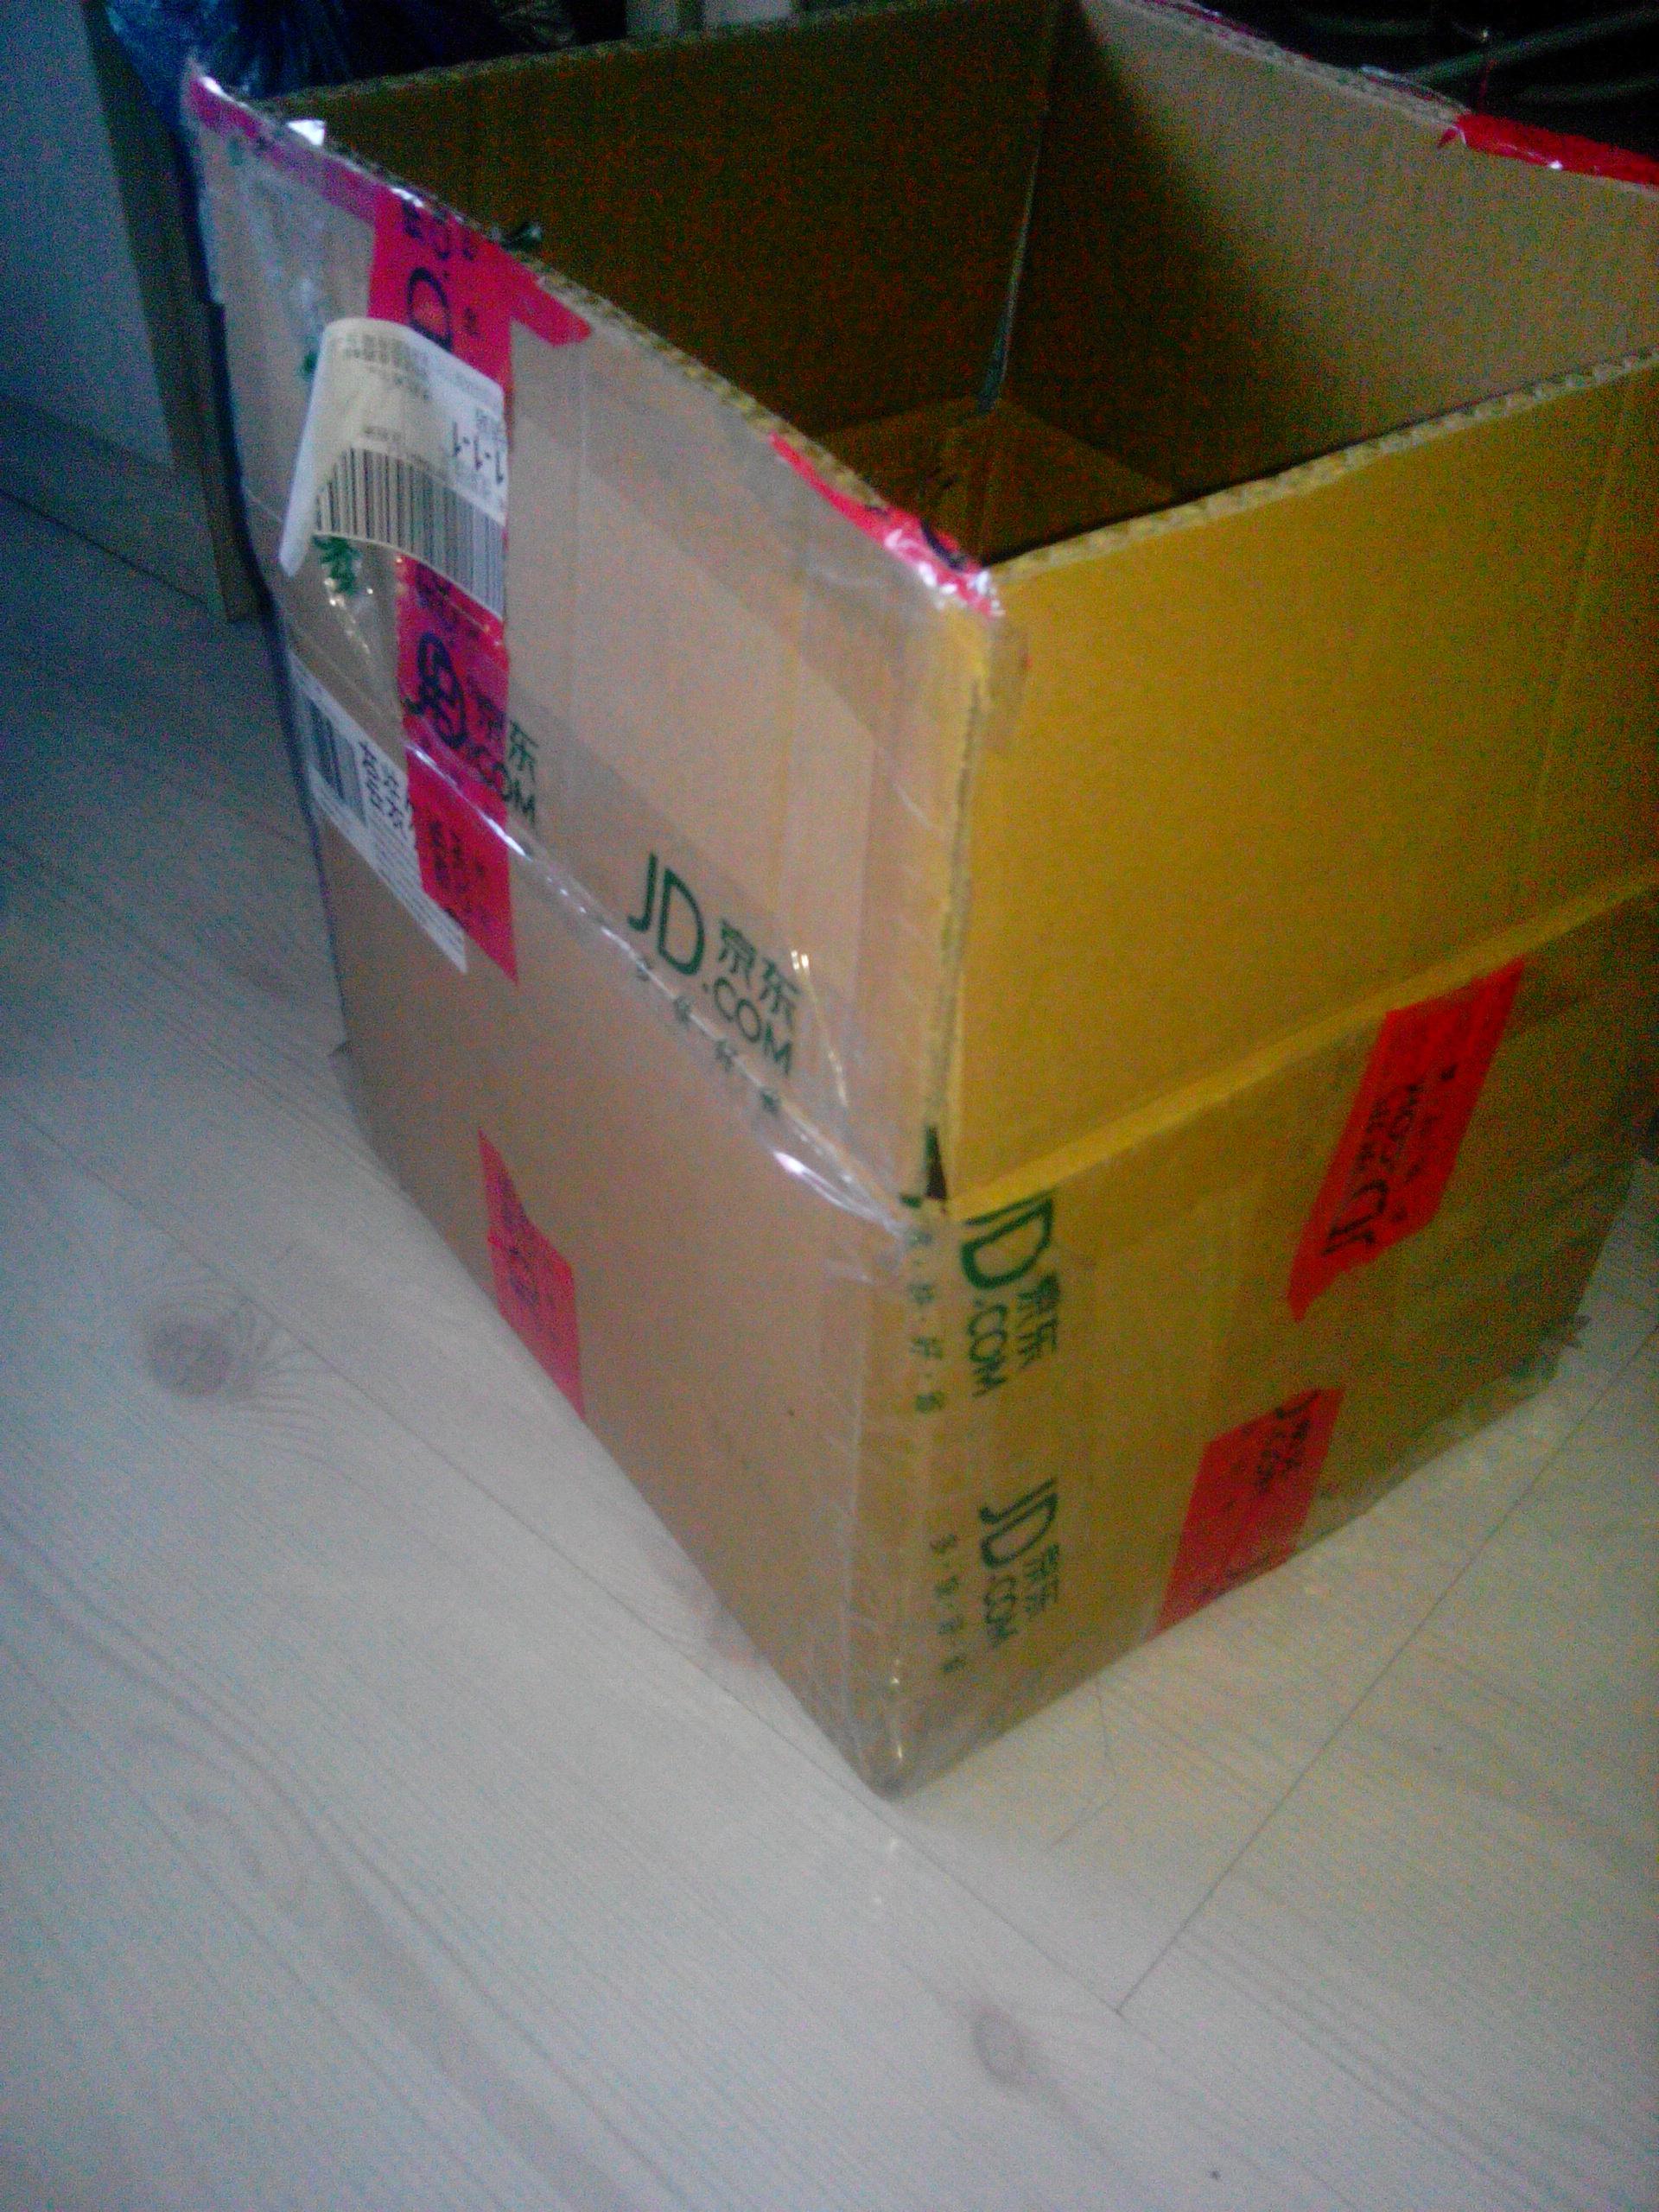 jordan vogt-roberts 00987063 cheapestonline